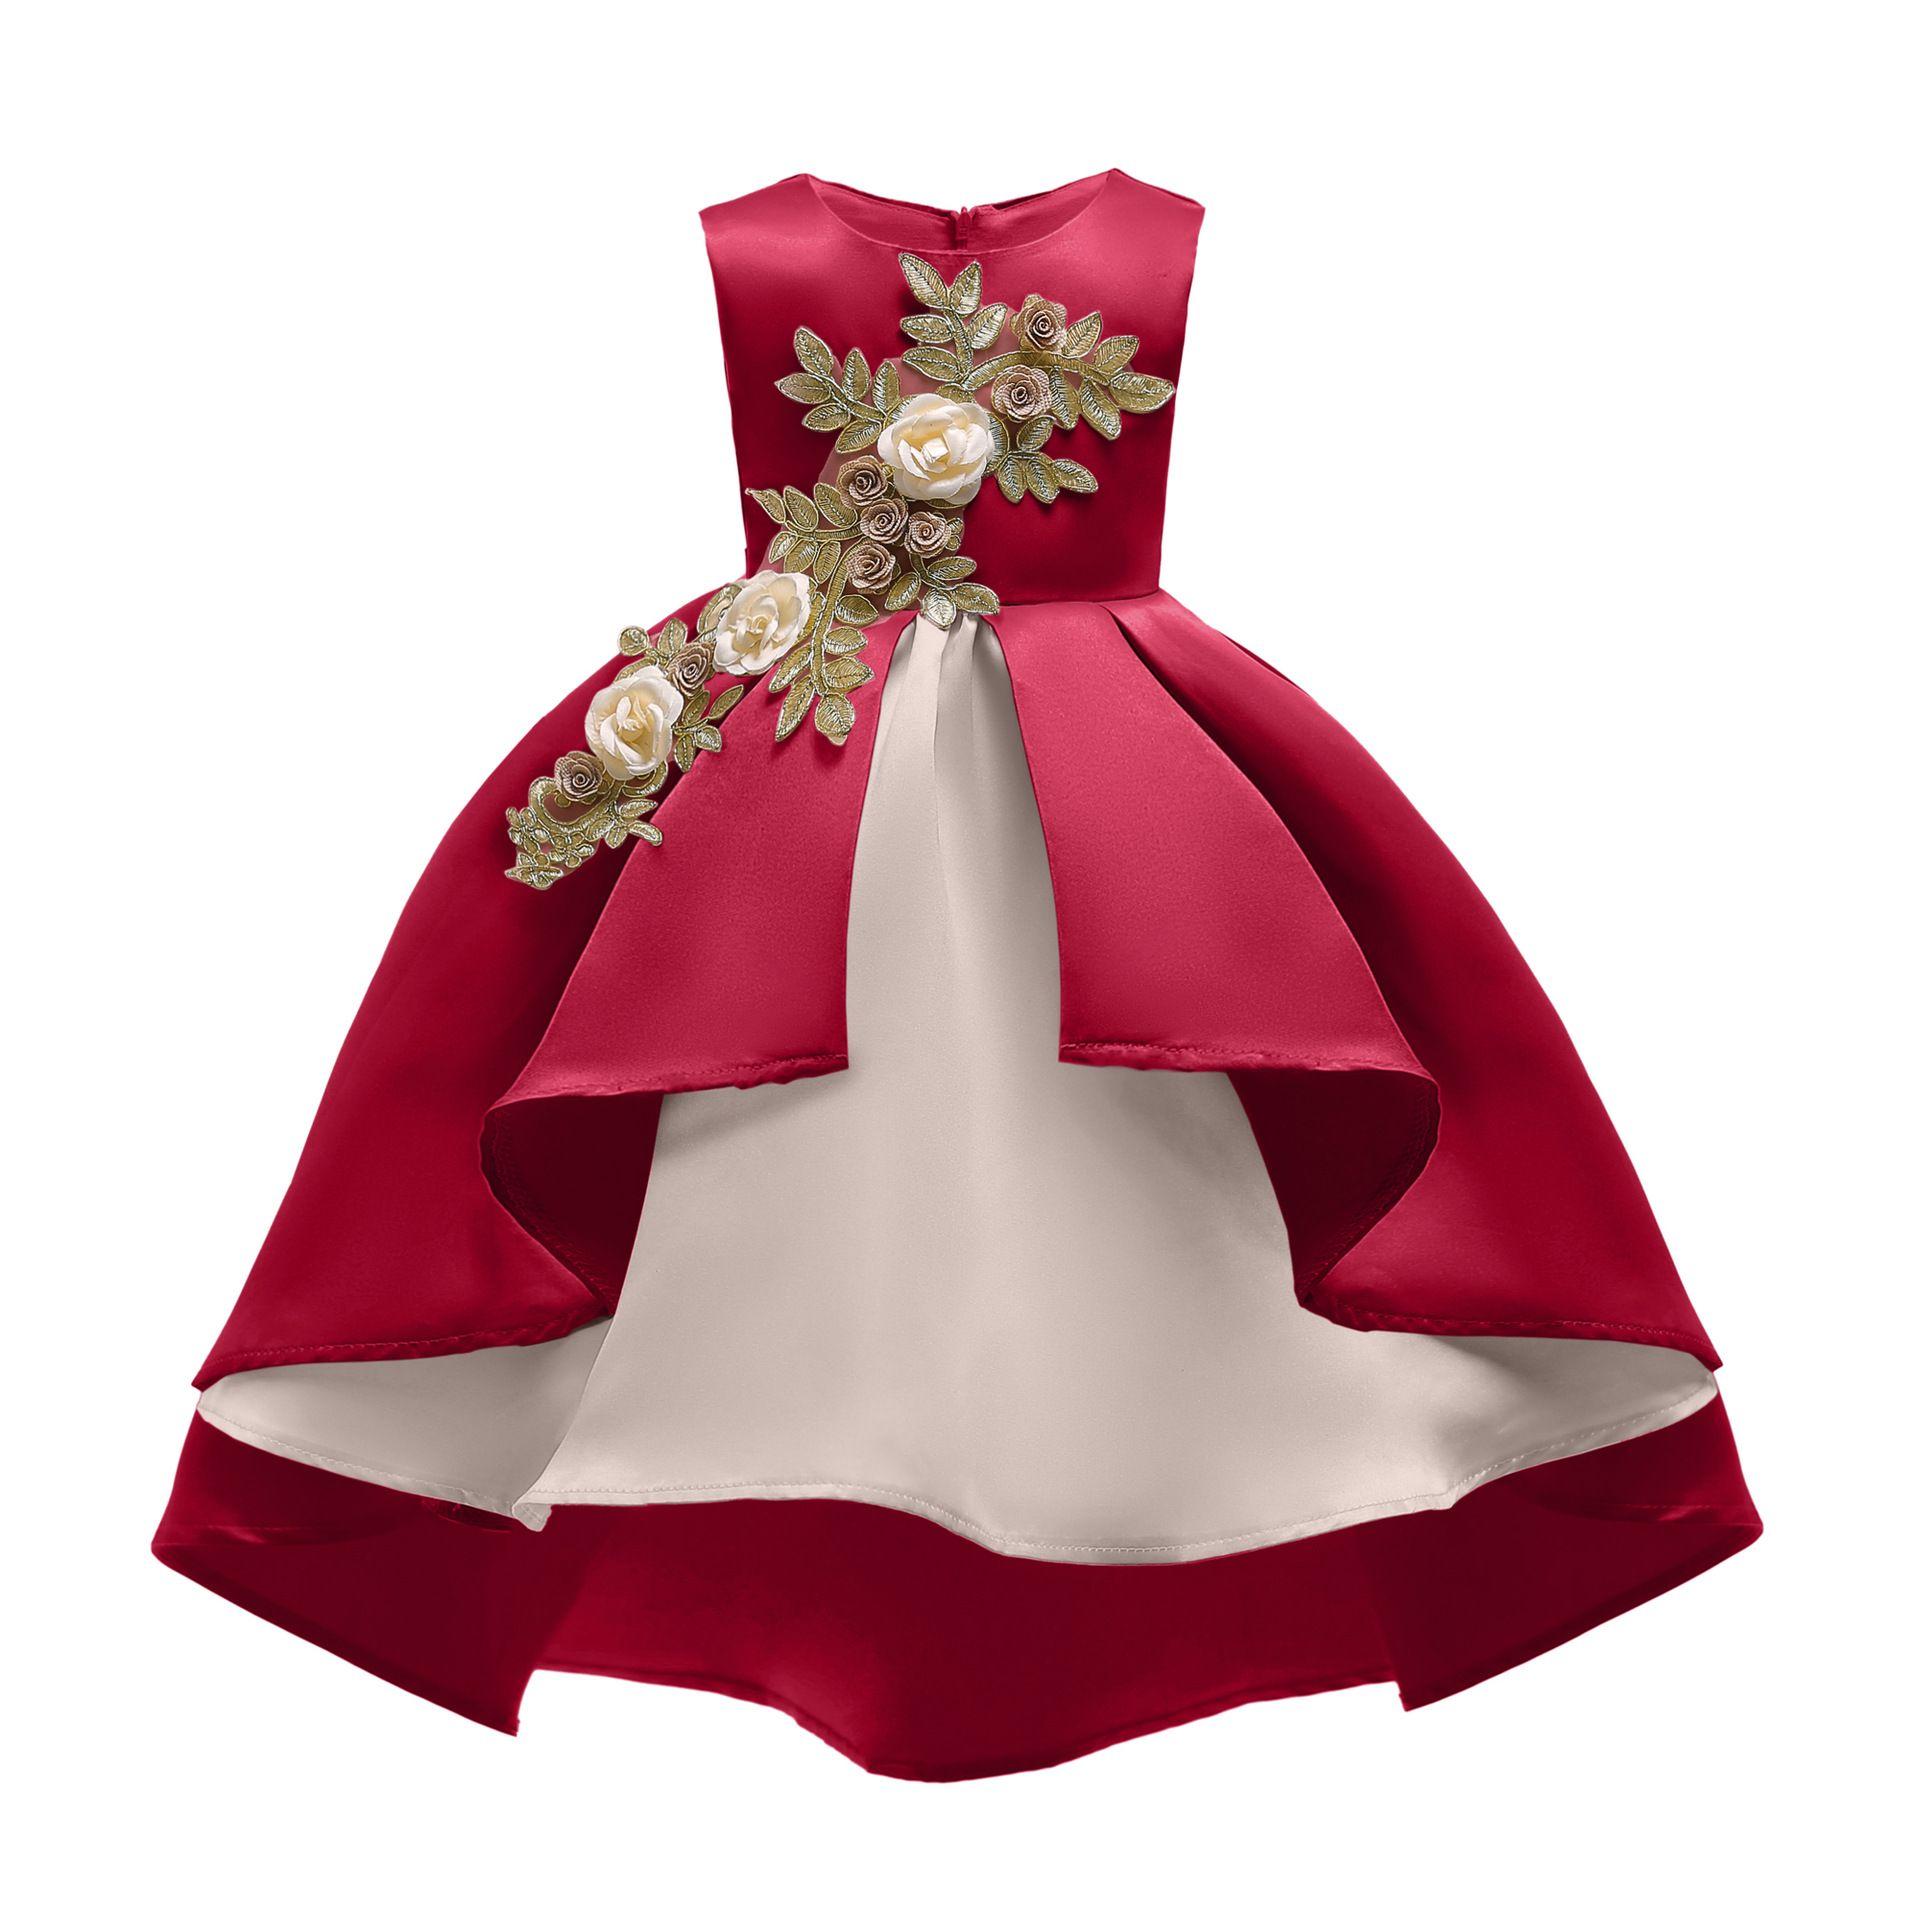 64b3f938ce7 Girls Dress Fashion New Children Chirstmas Party Dresses Kids Flower Dress  Round Neck Short Sleeve Bows Belt Princess Dress Ball Gown X067 Girls Dress  Kids ...